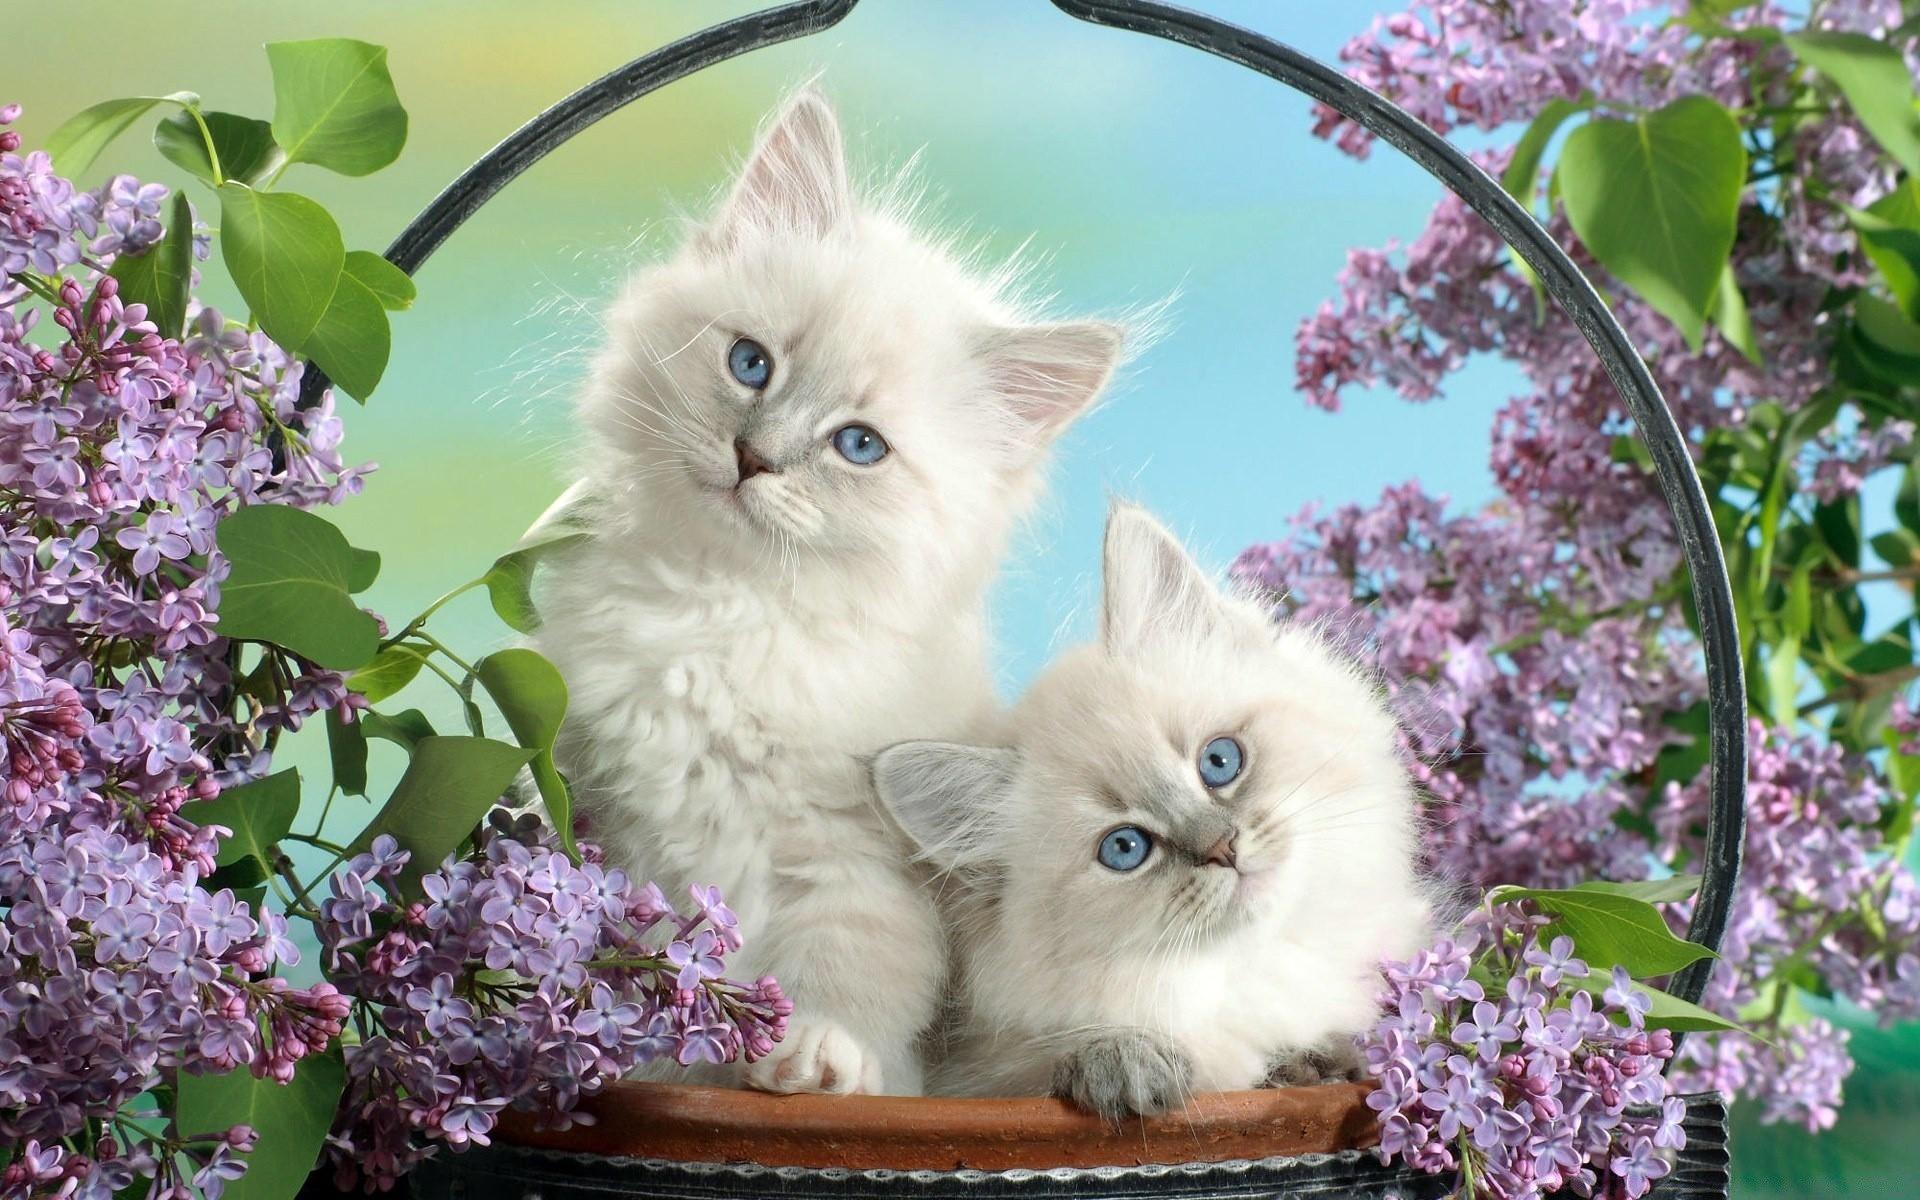 Обои на телефон котята красивые (19)